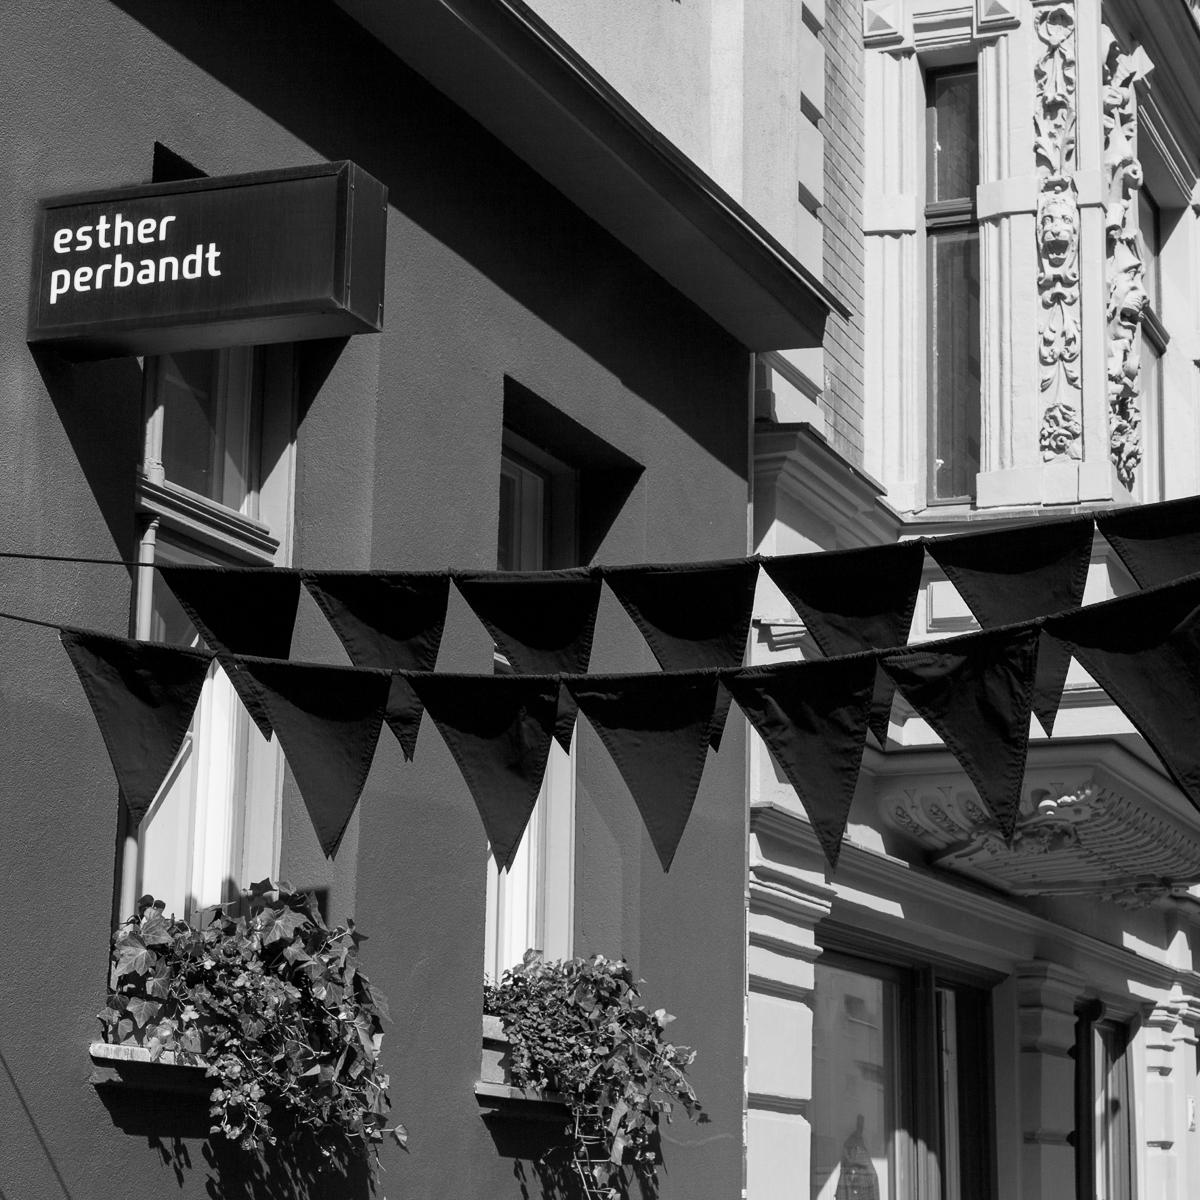 Esther Perbandt Berlin